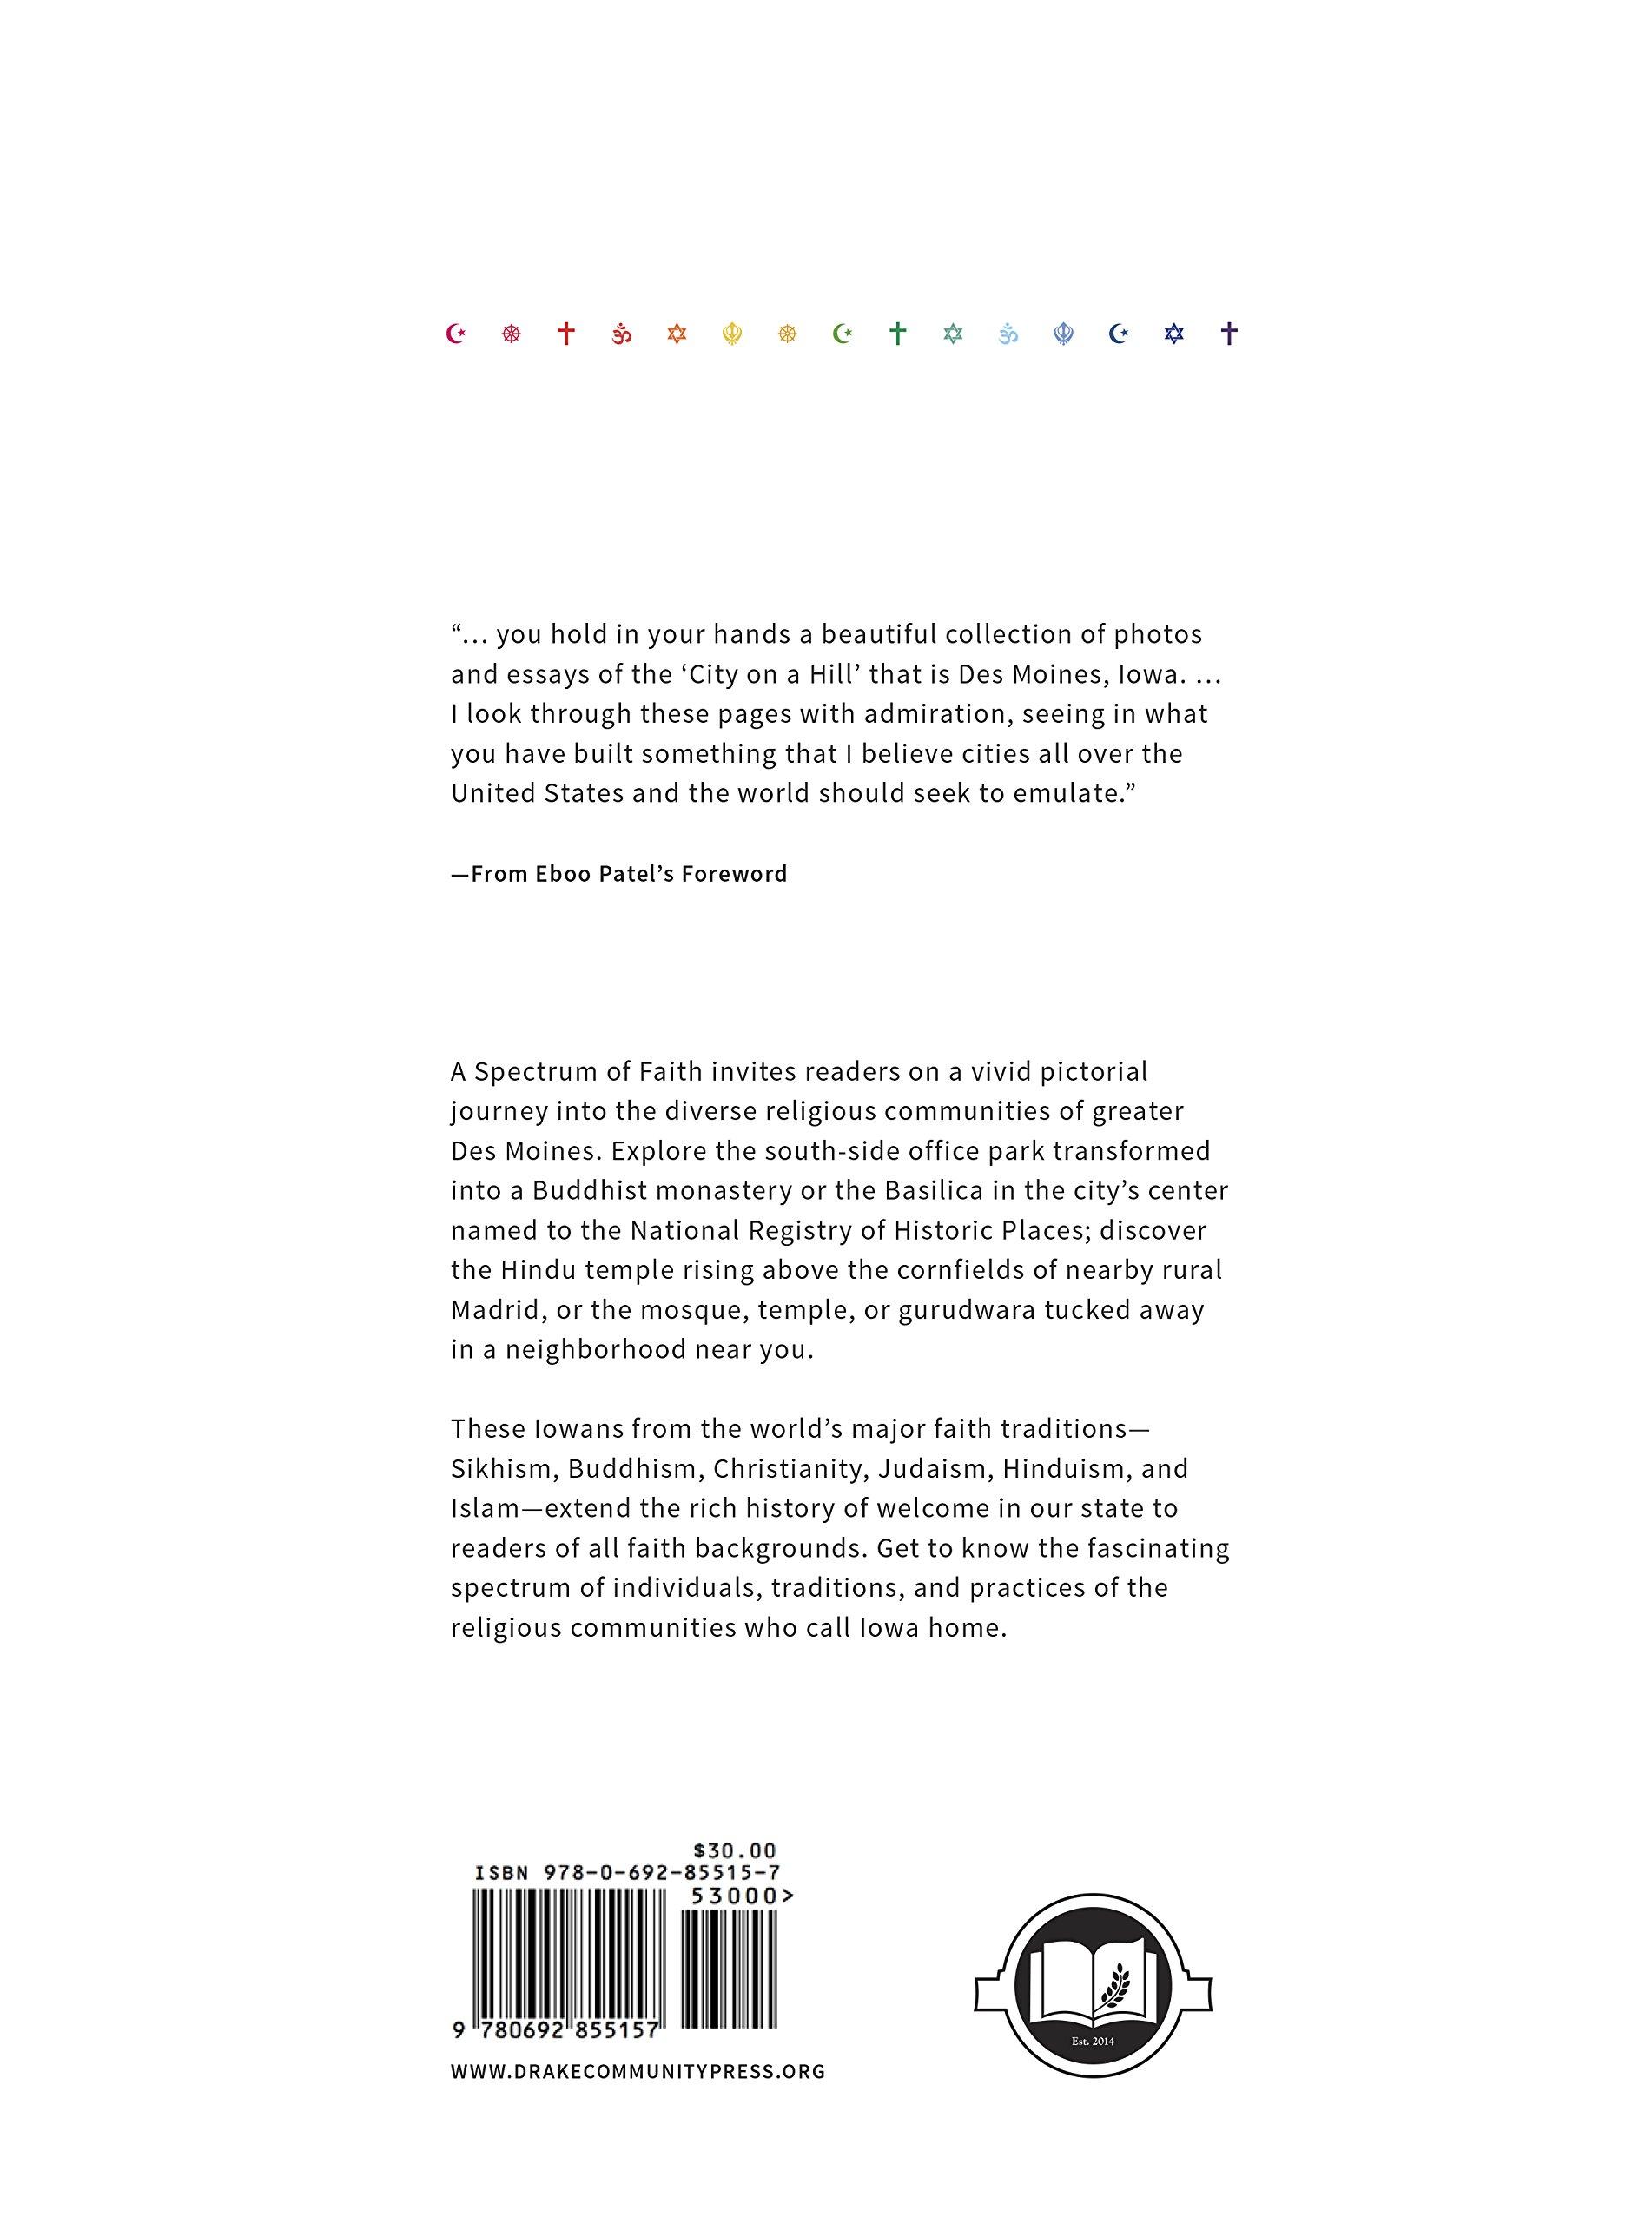 A Spectrum of Faith Religions of the World in Americau0027s Heartland Drake Community Press Timothy D. Knepper Eboo Patel Bob Blanchard 9780692855157 ...  sc 1 st  Amazon.com & A Spectrum of Faith: Religions of the World in Americau0027s Heartland ... azcodes.com